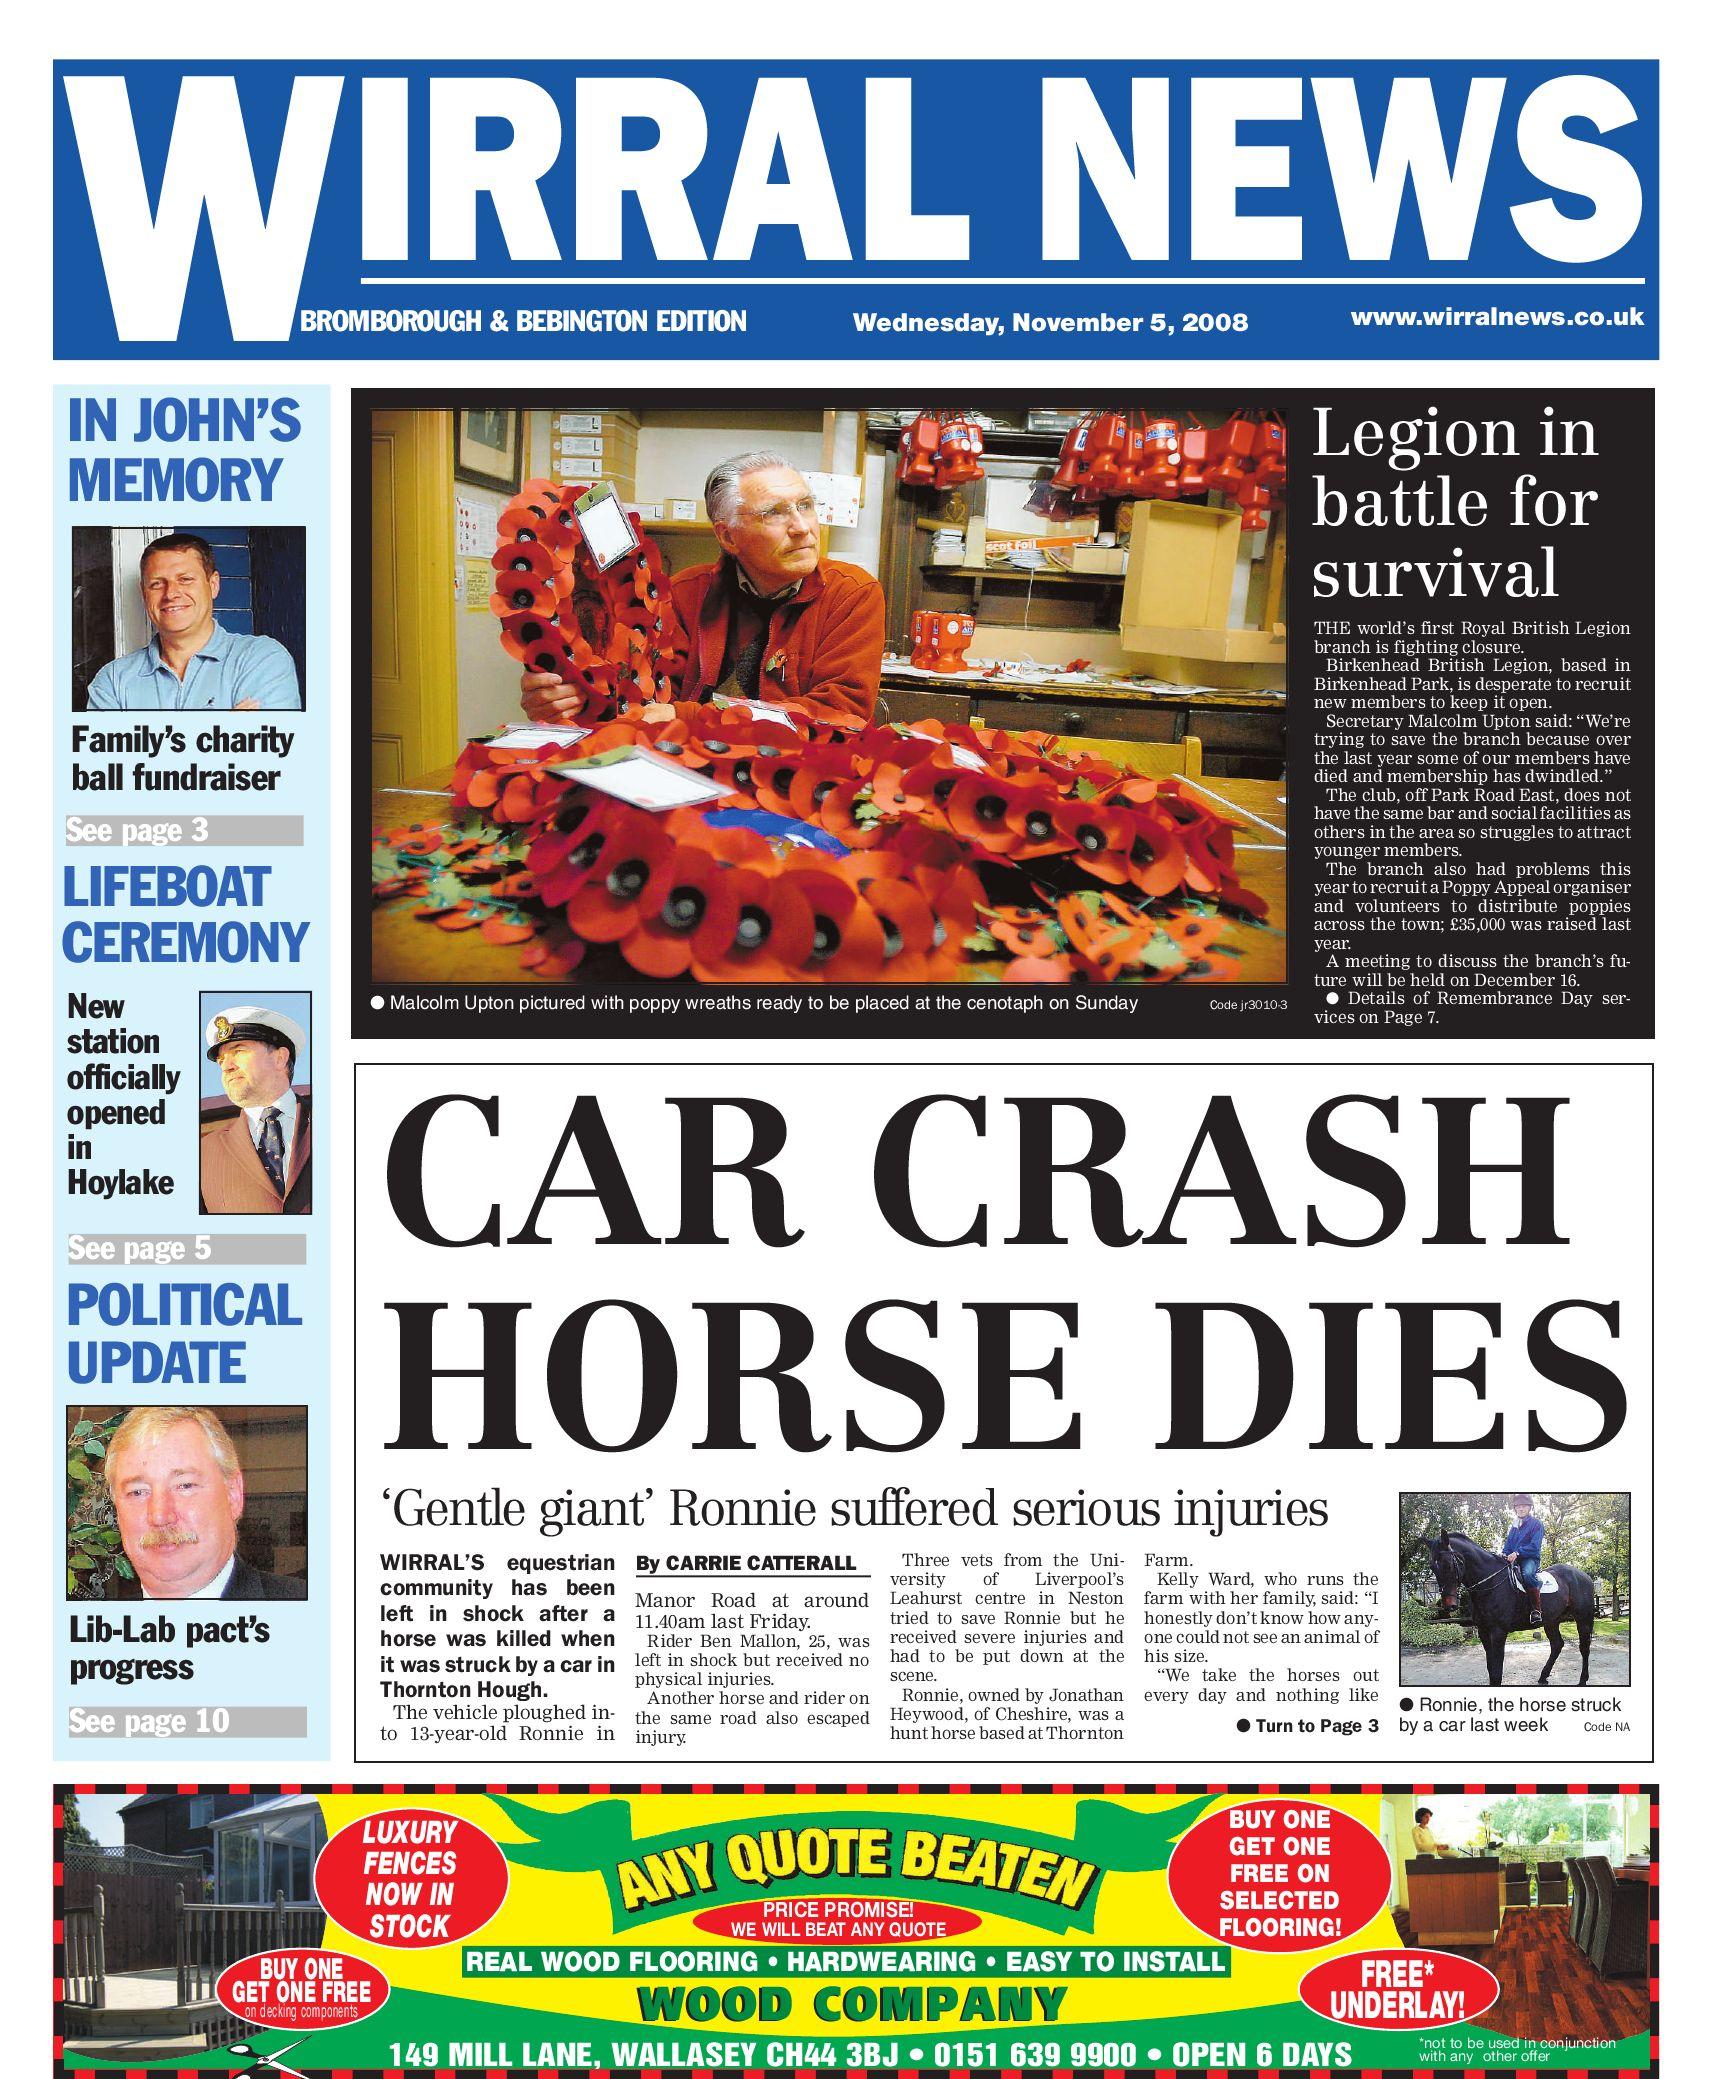 Wirral News - Bromborough   Bebington Edition by Merseyside.Weeklies  v1s1ter - issuu f03611bc8